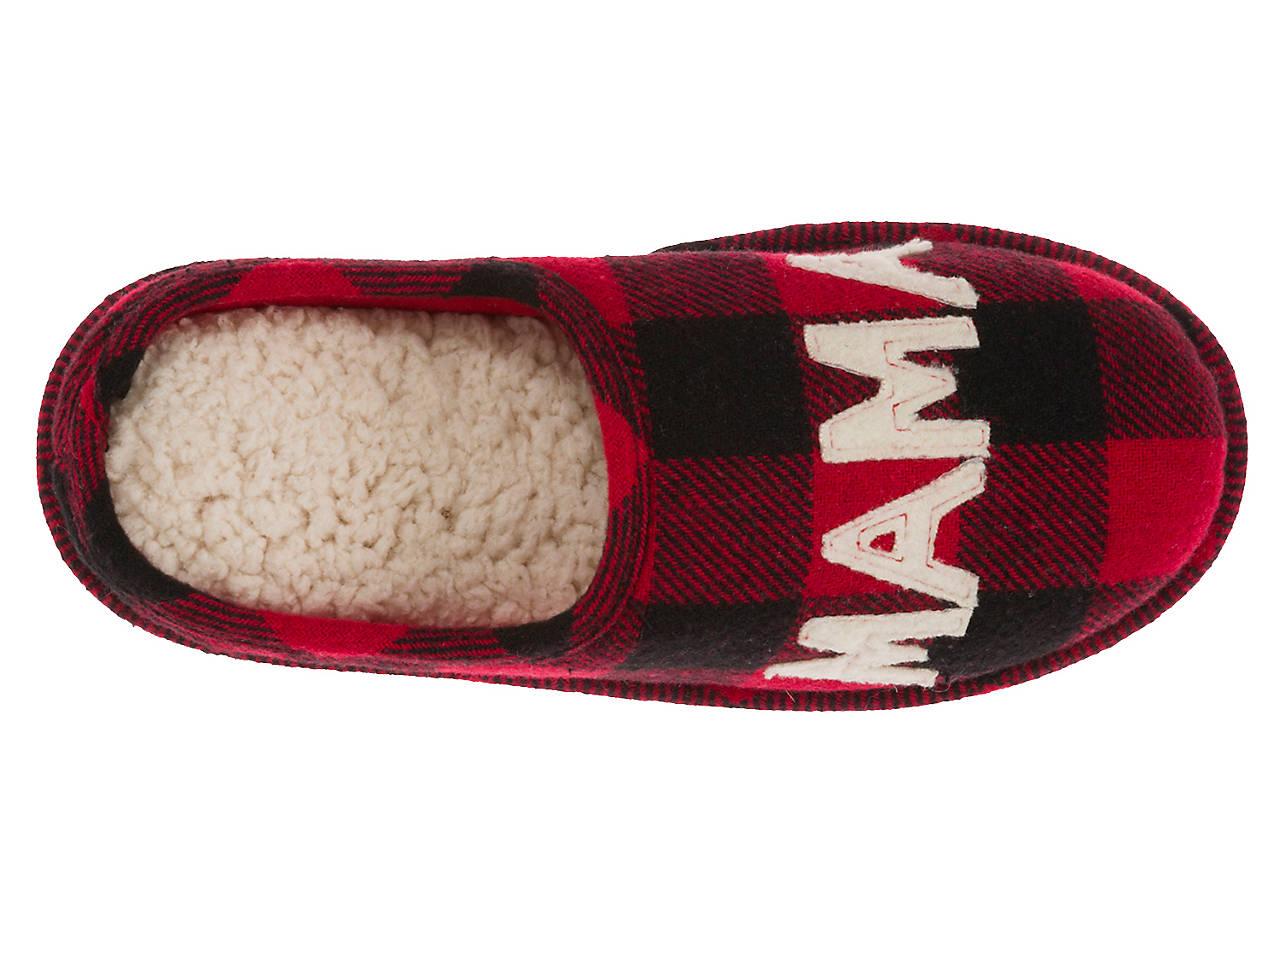 4897c13e8f0 Dearfoams Mama Bear Scuff Slipper Women s Shoes